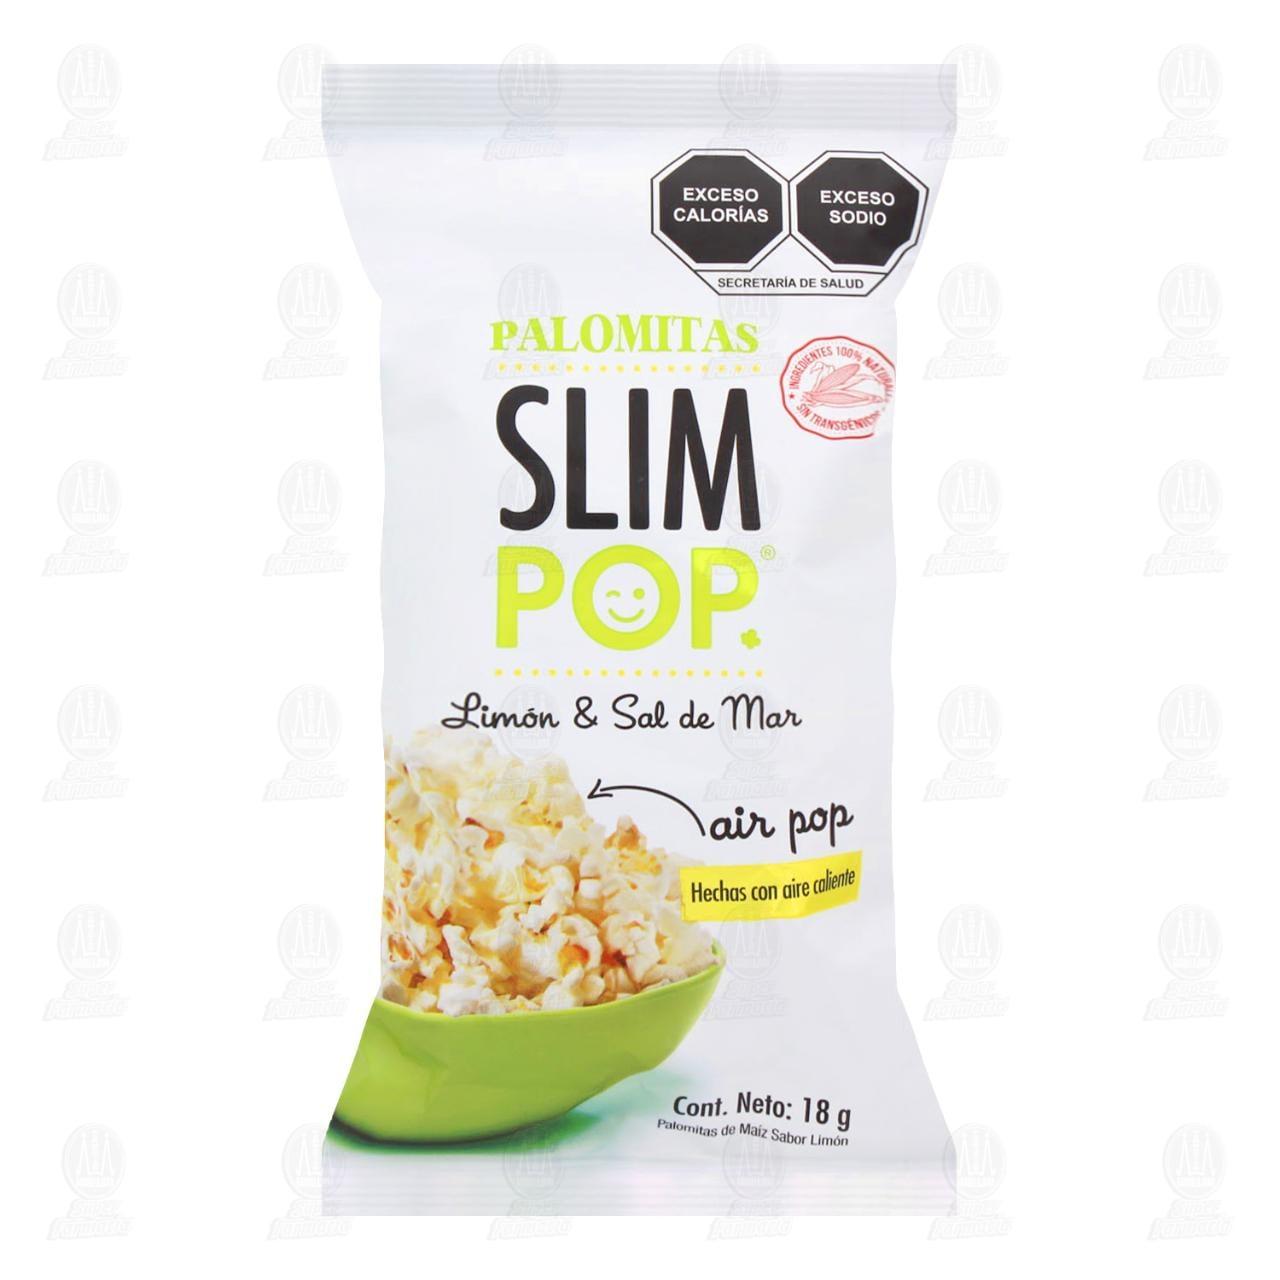 Palomitas Slim Pop Limón & Sal de Mar, 18 gr.